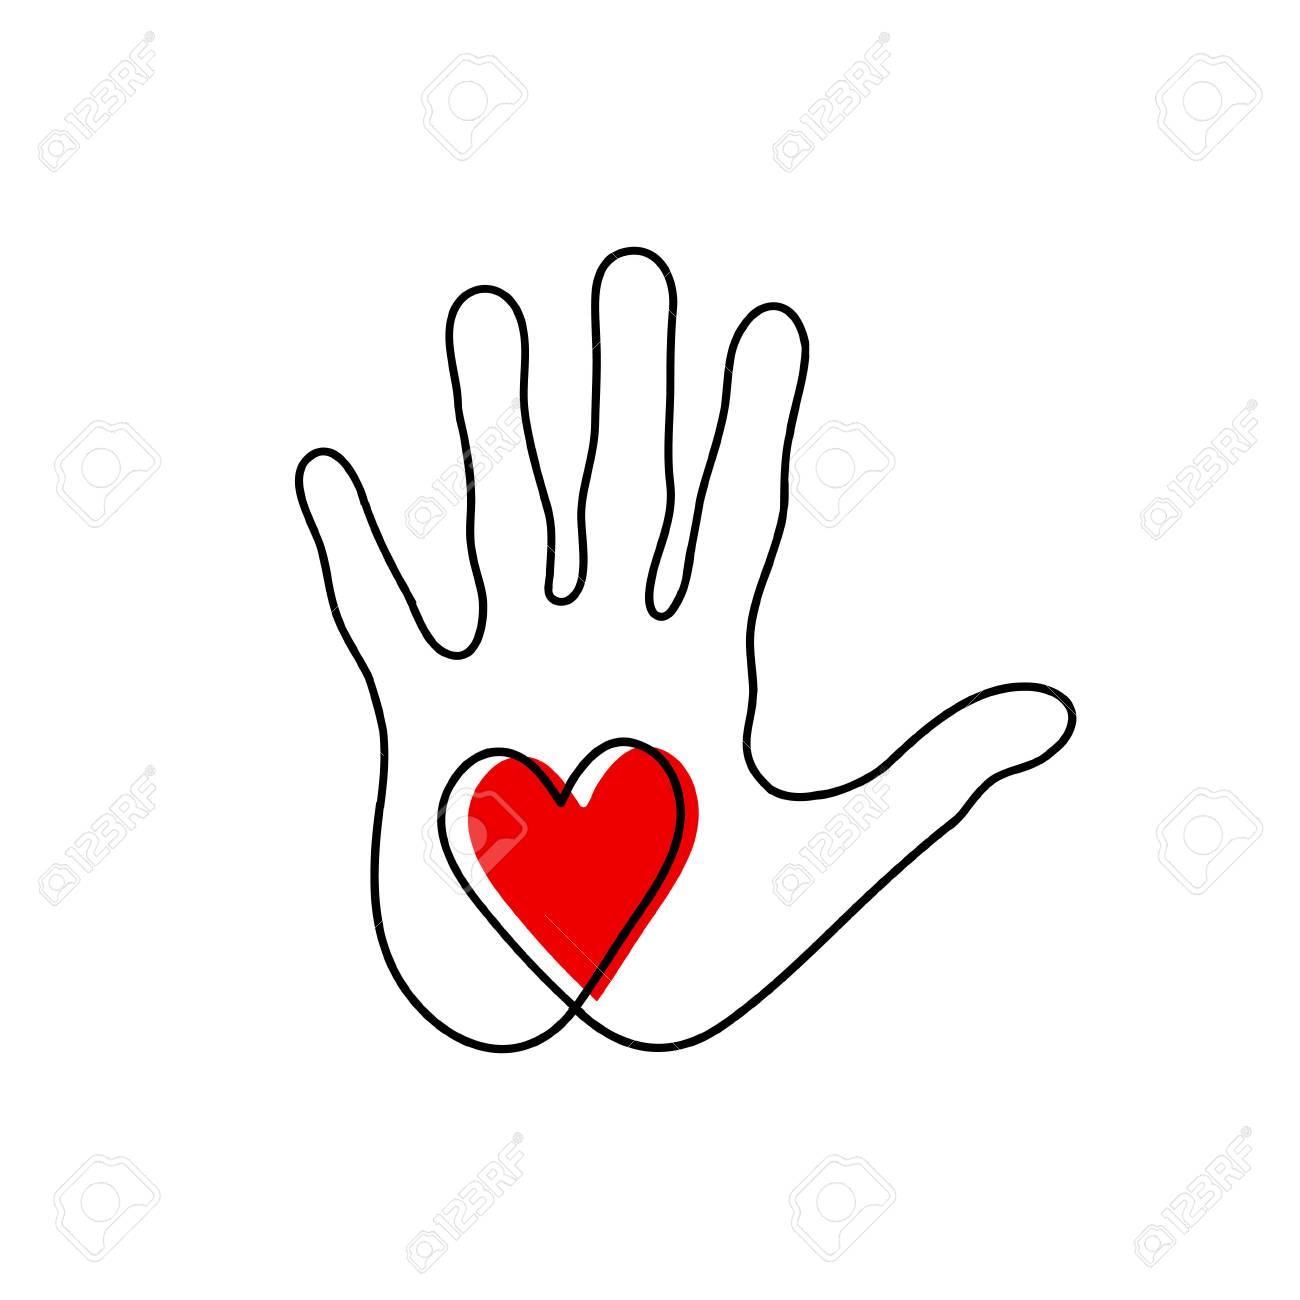 Random Acts Drawings Kindness Clipart Heart Wwwtollebildcom